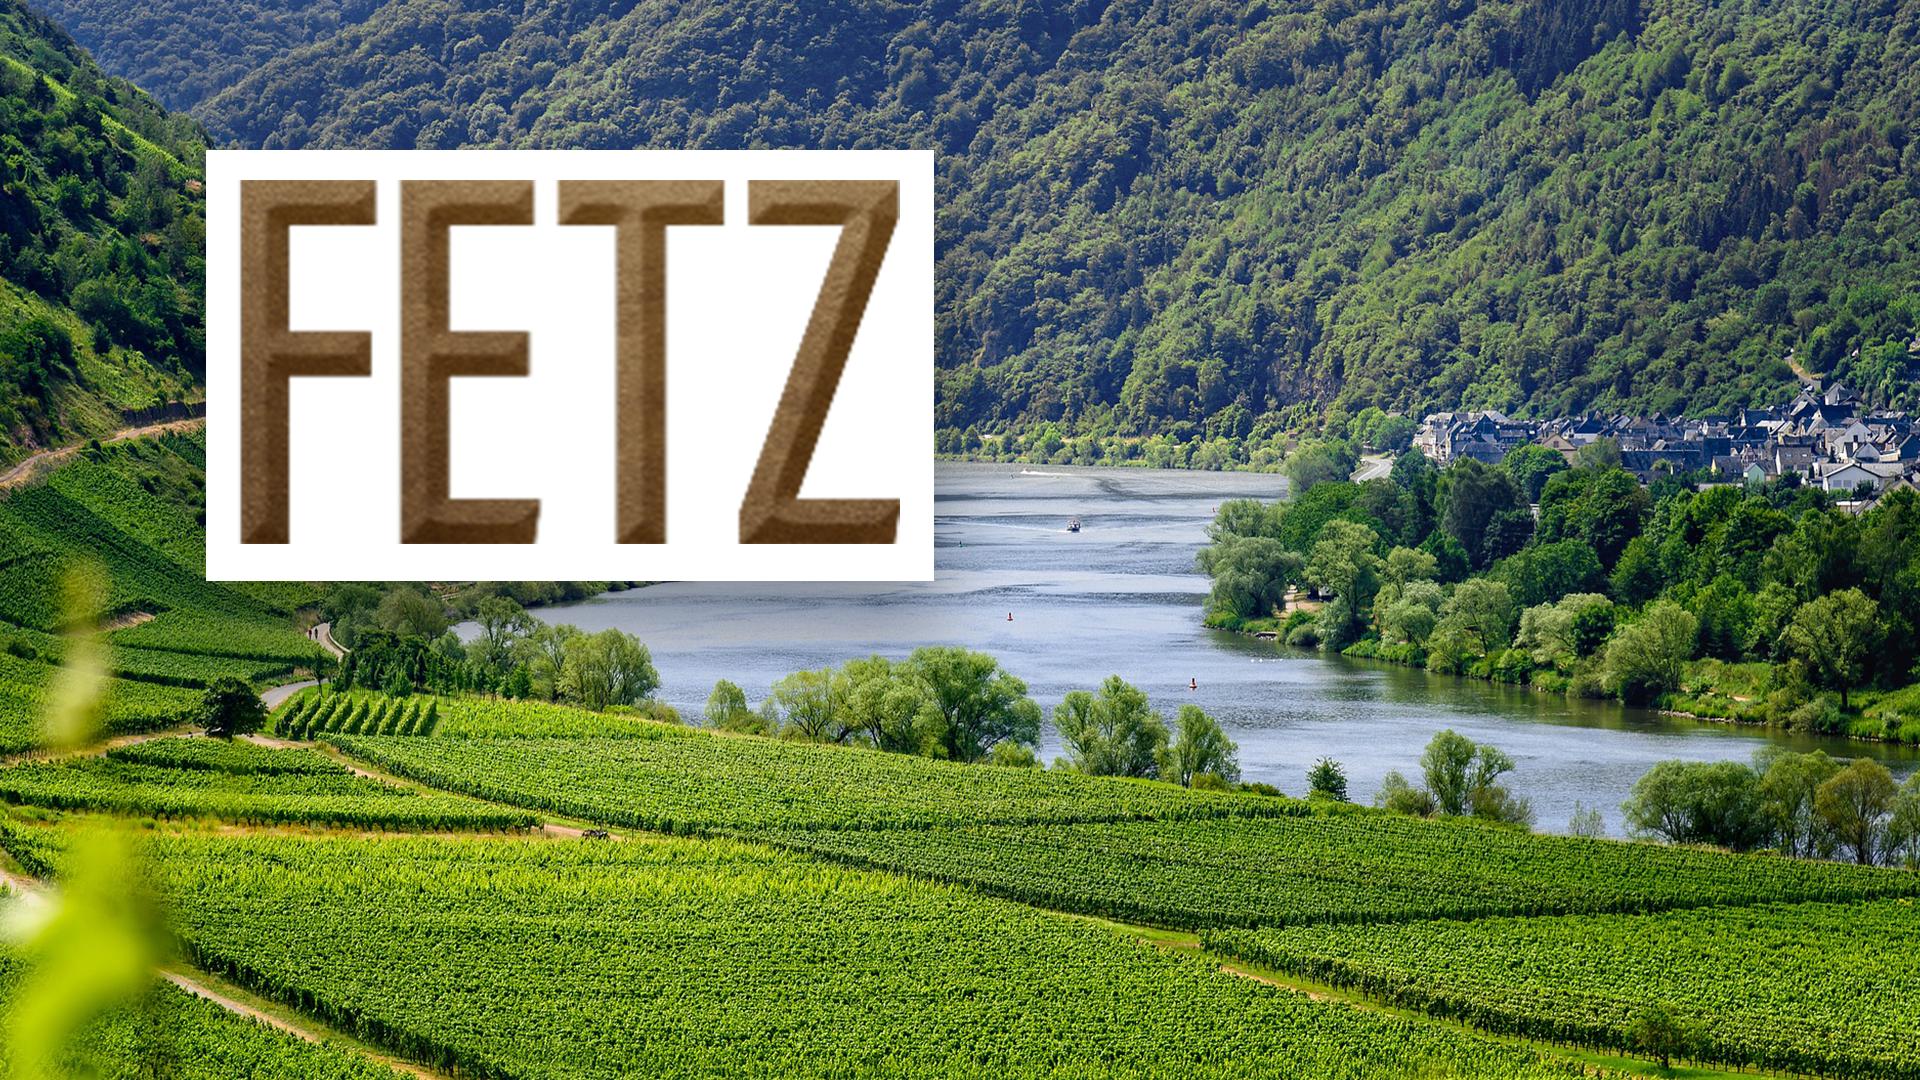 Heinz-Uwe Fetz – Fetz winery and distillery